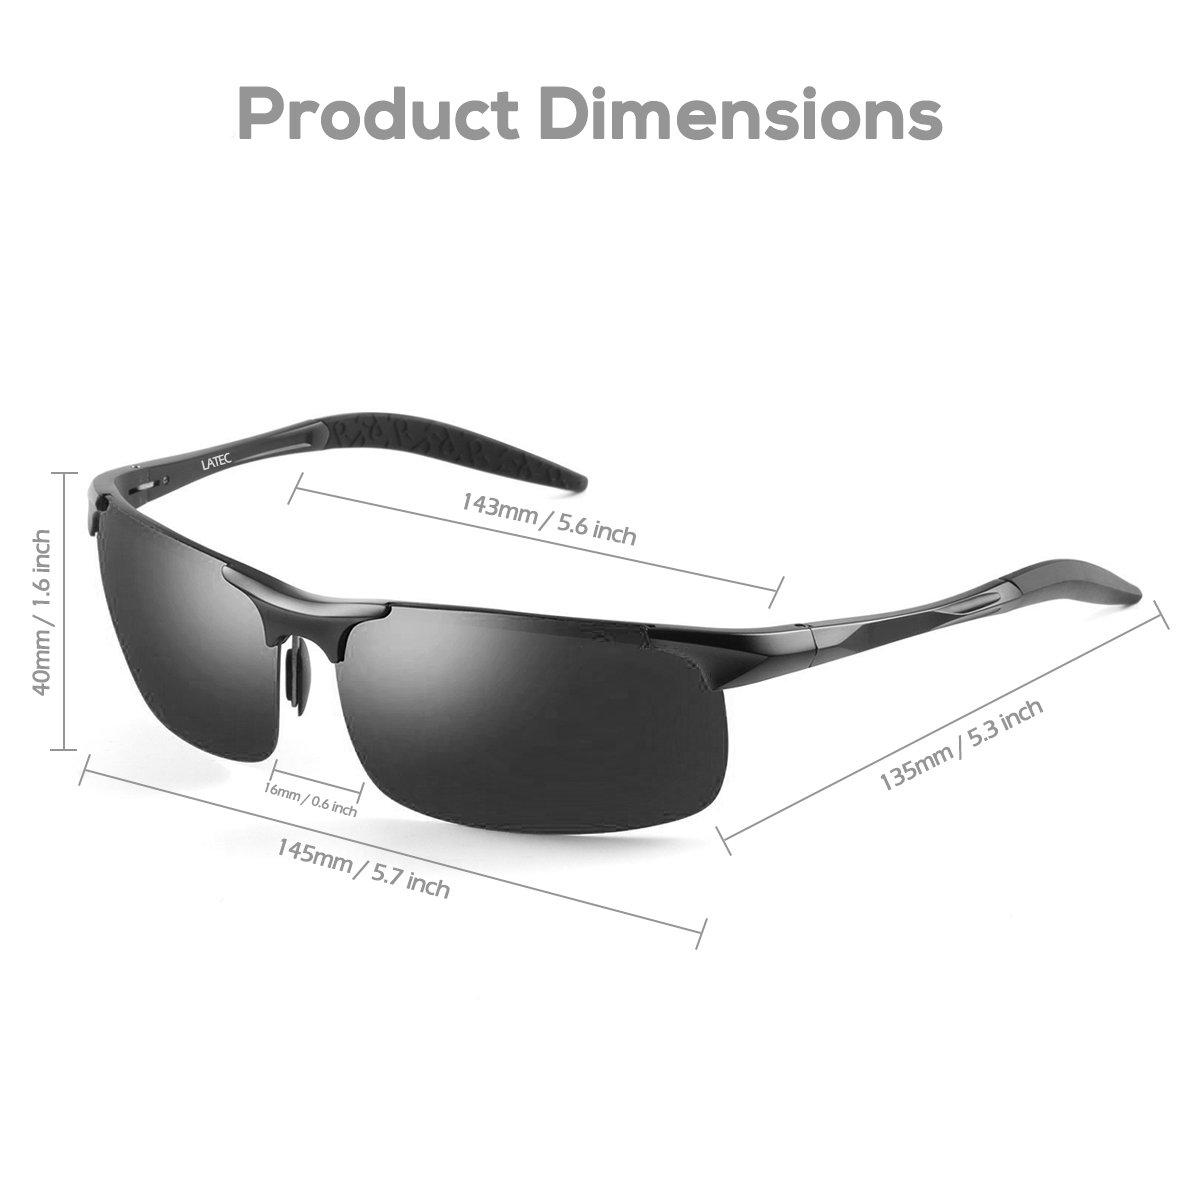 f2db50520d383 Polarized Driving Sunglasses